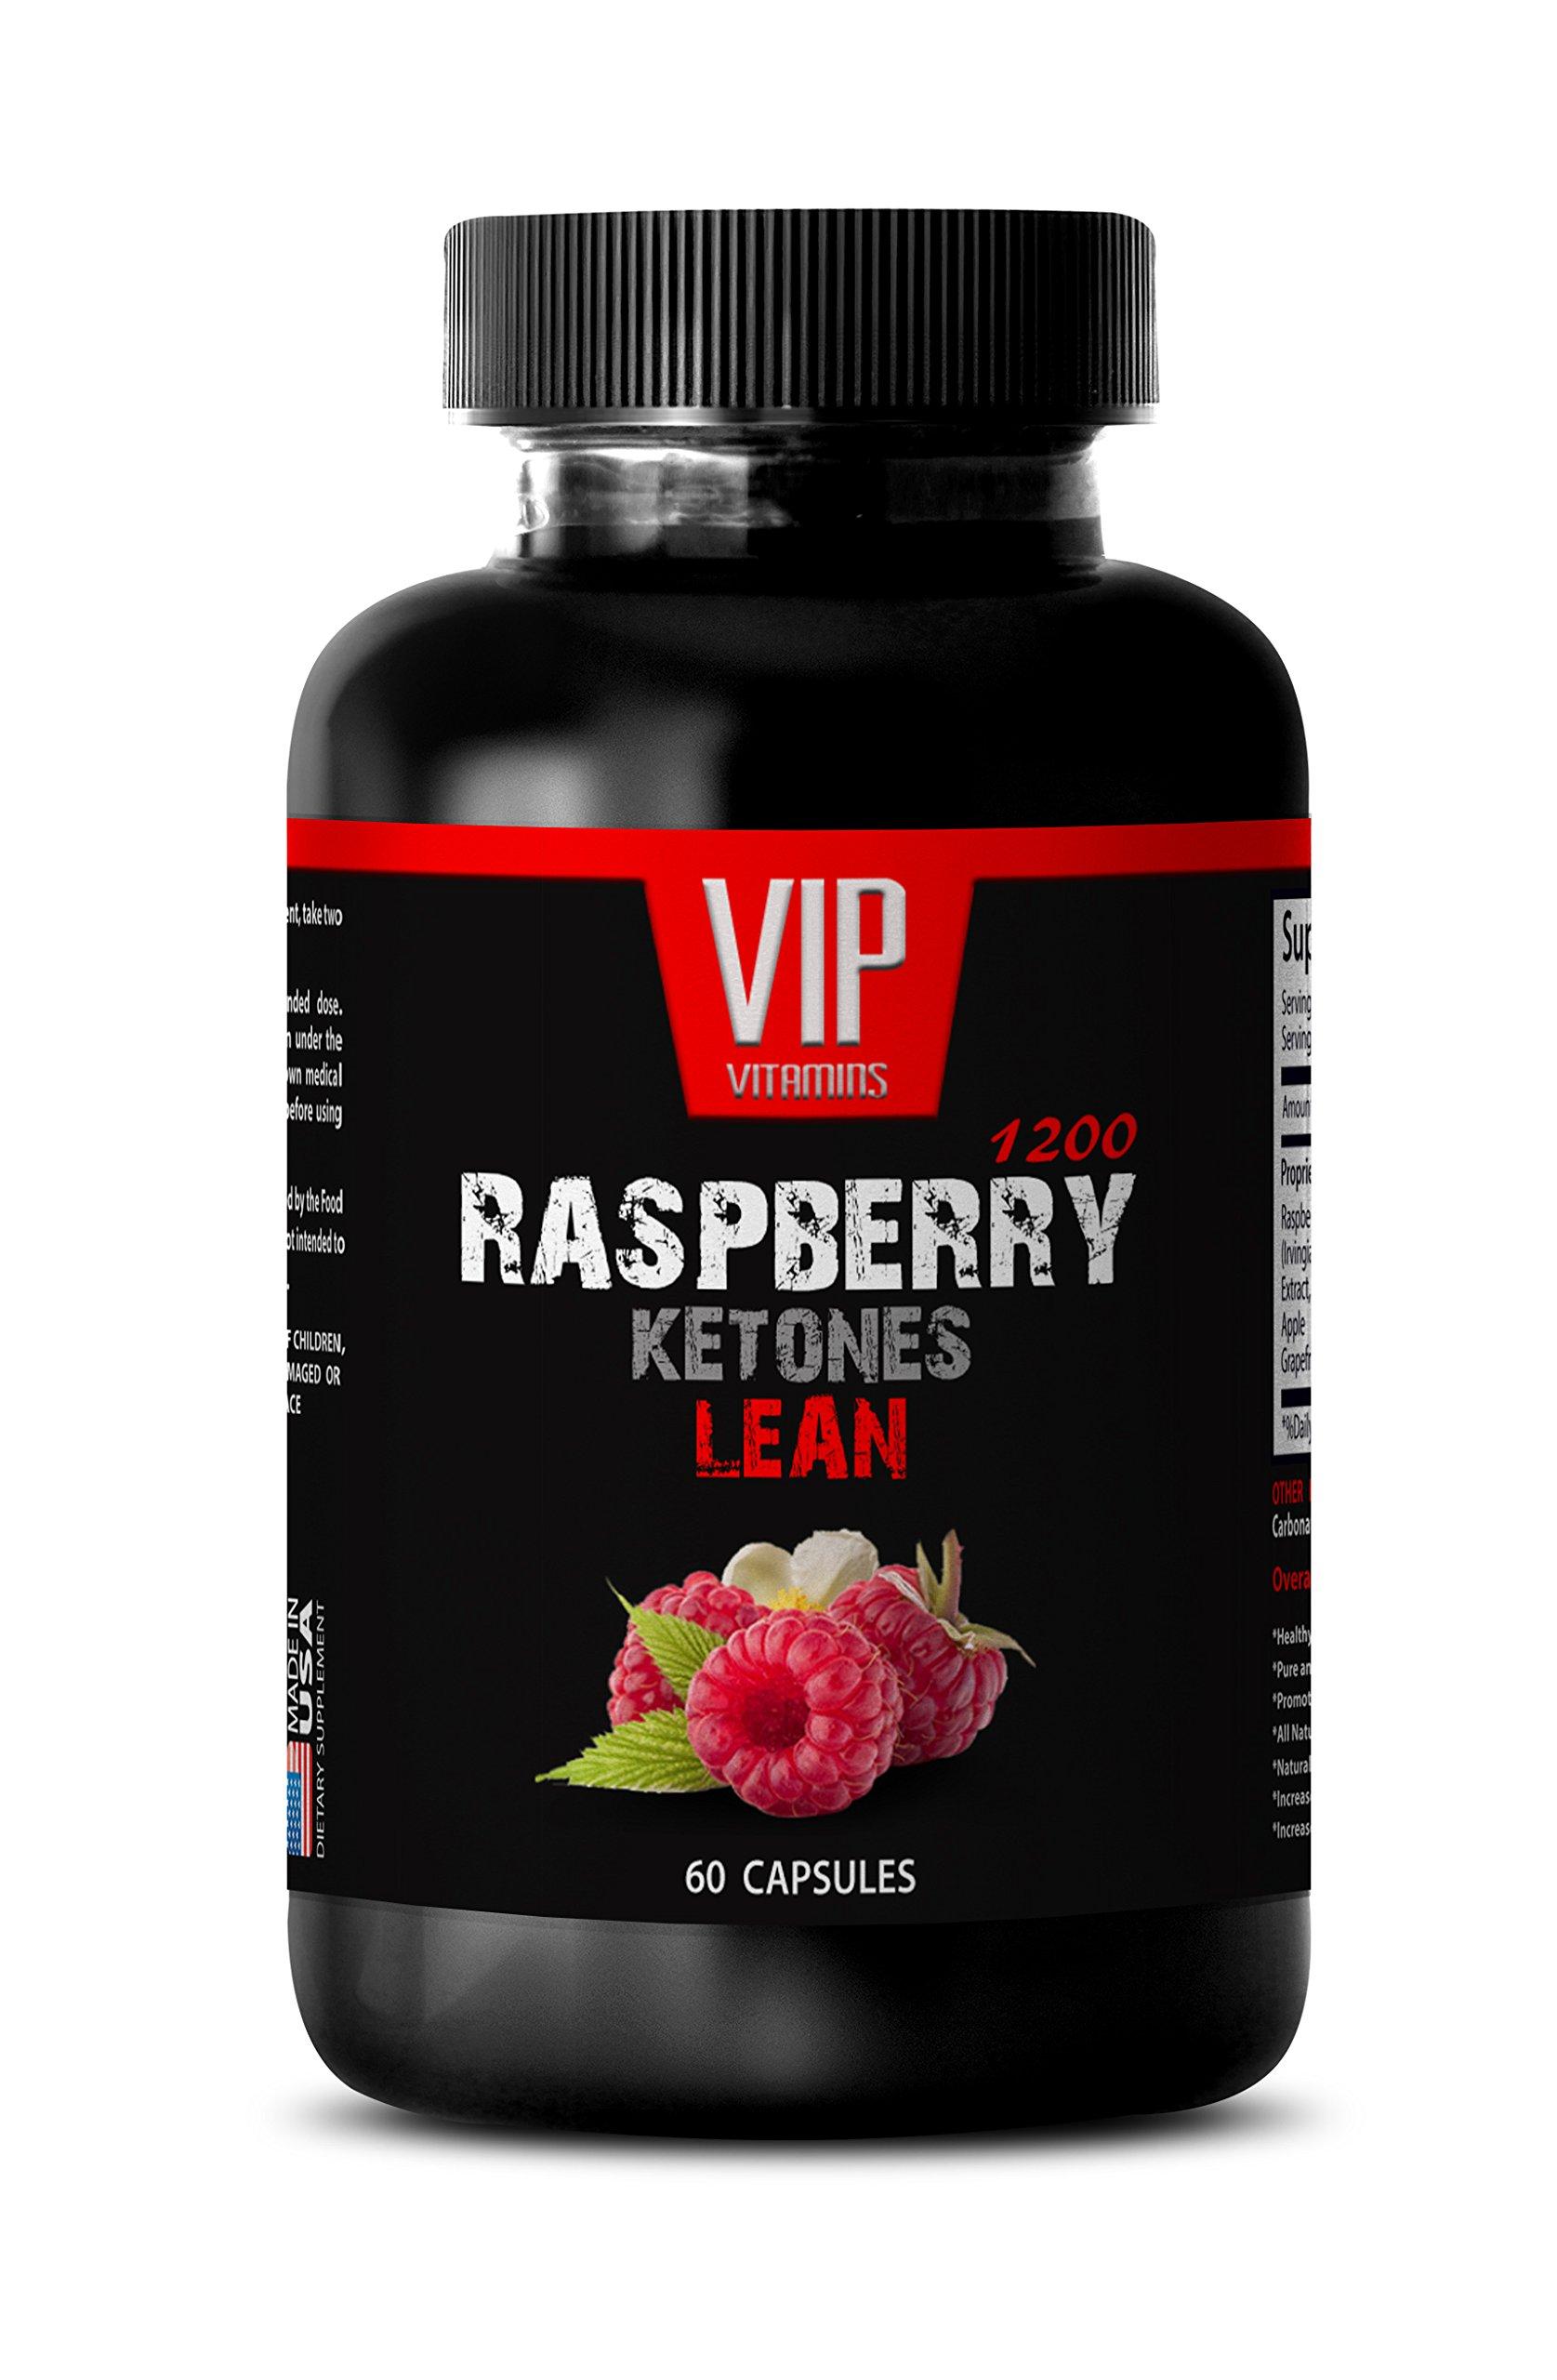 Weight loss supplements for women - RASPBERRY KETONES LEAN 1200 EXTRACT - Raspberry ketones green tea extract and african mango for weight loss - 1 Bottle 60 Capsules